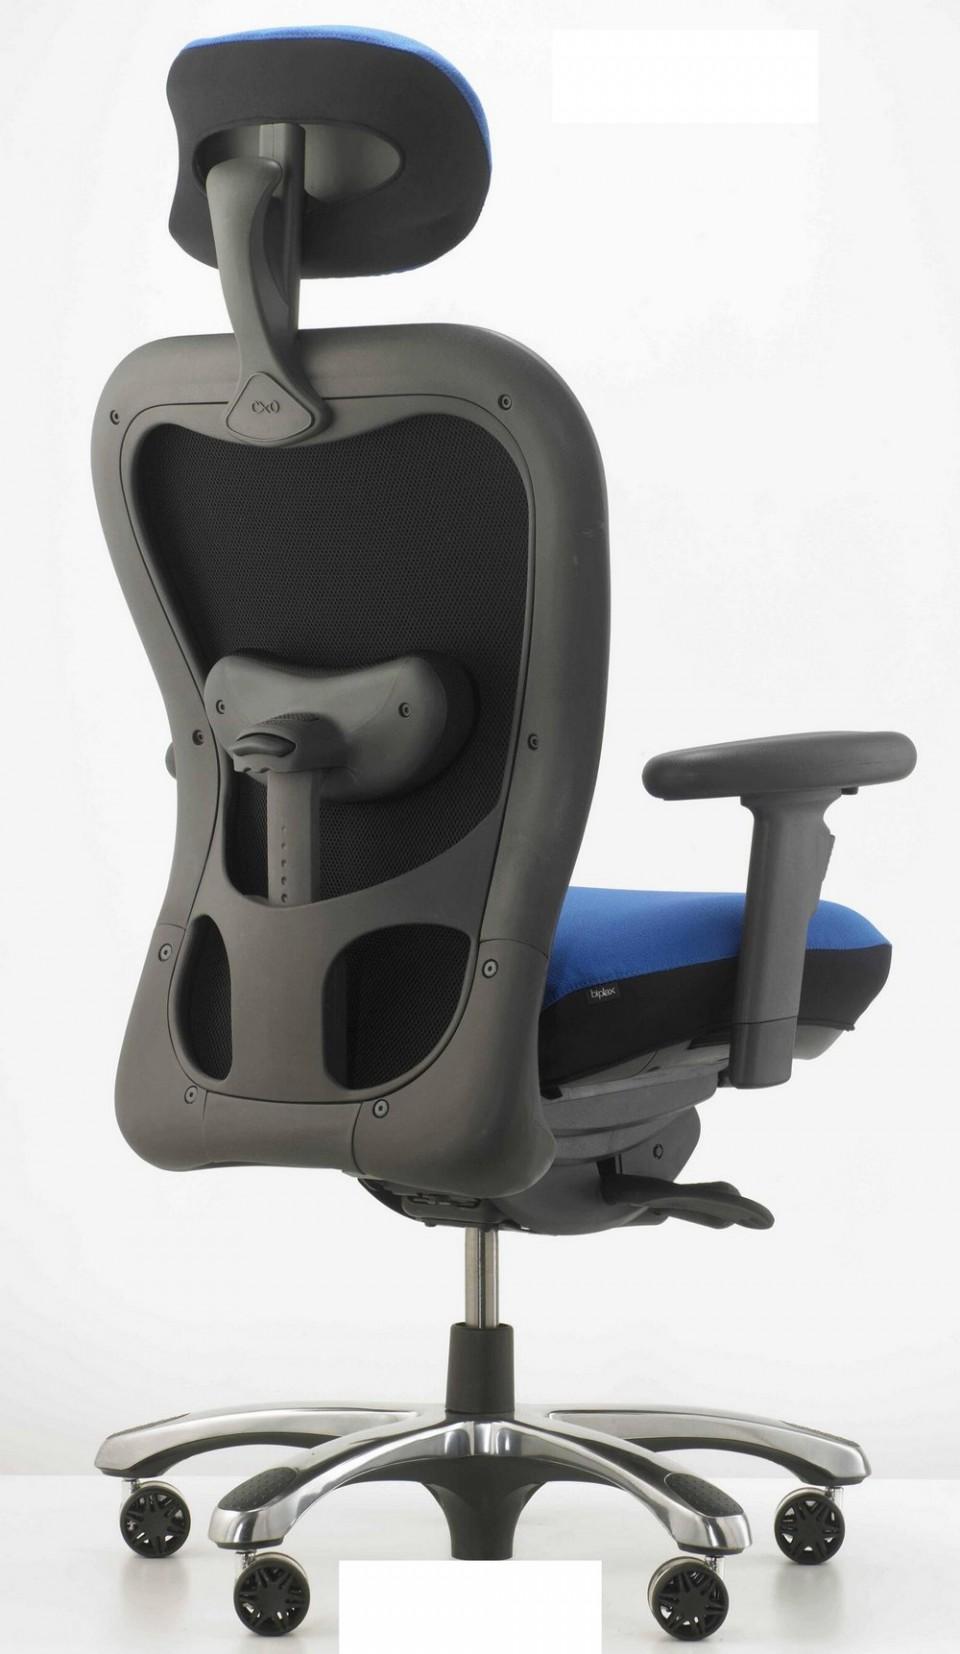 fauteuil 24 heures cxo achat fauteuils 24 heures 1 249 00. Black Bedroom Furniture Sets. Home Design Ideas